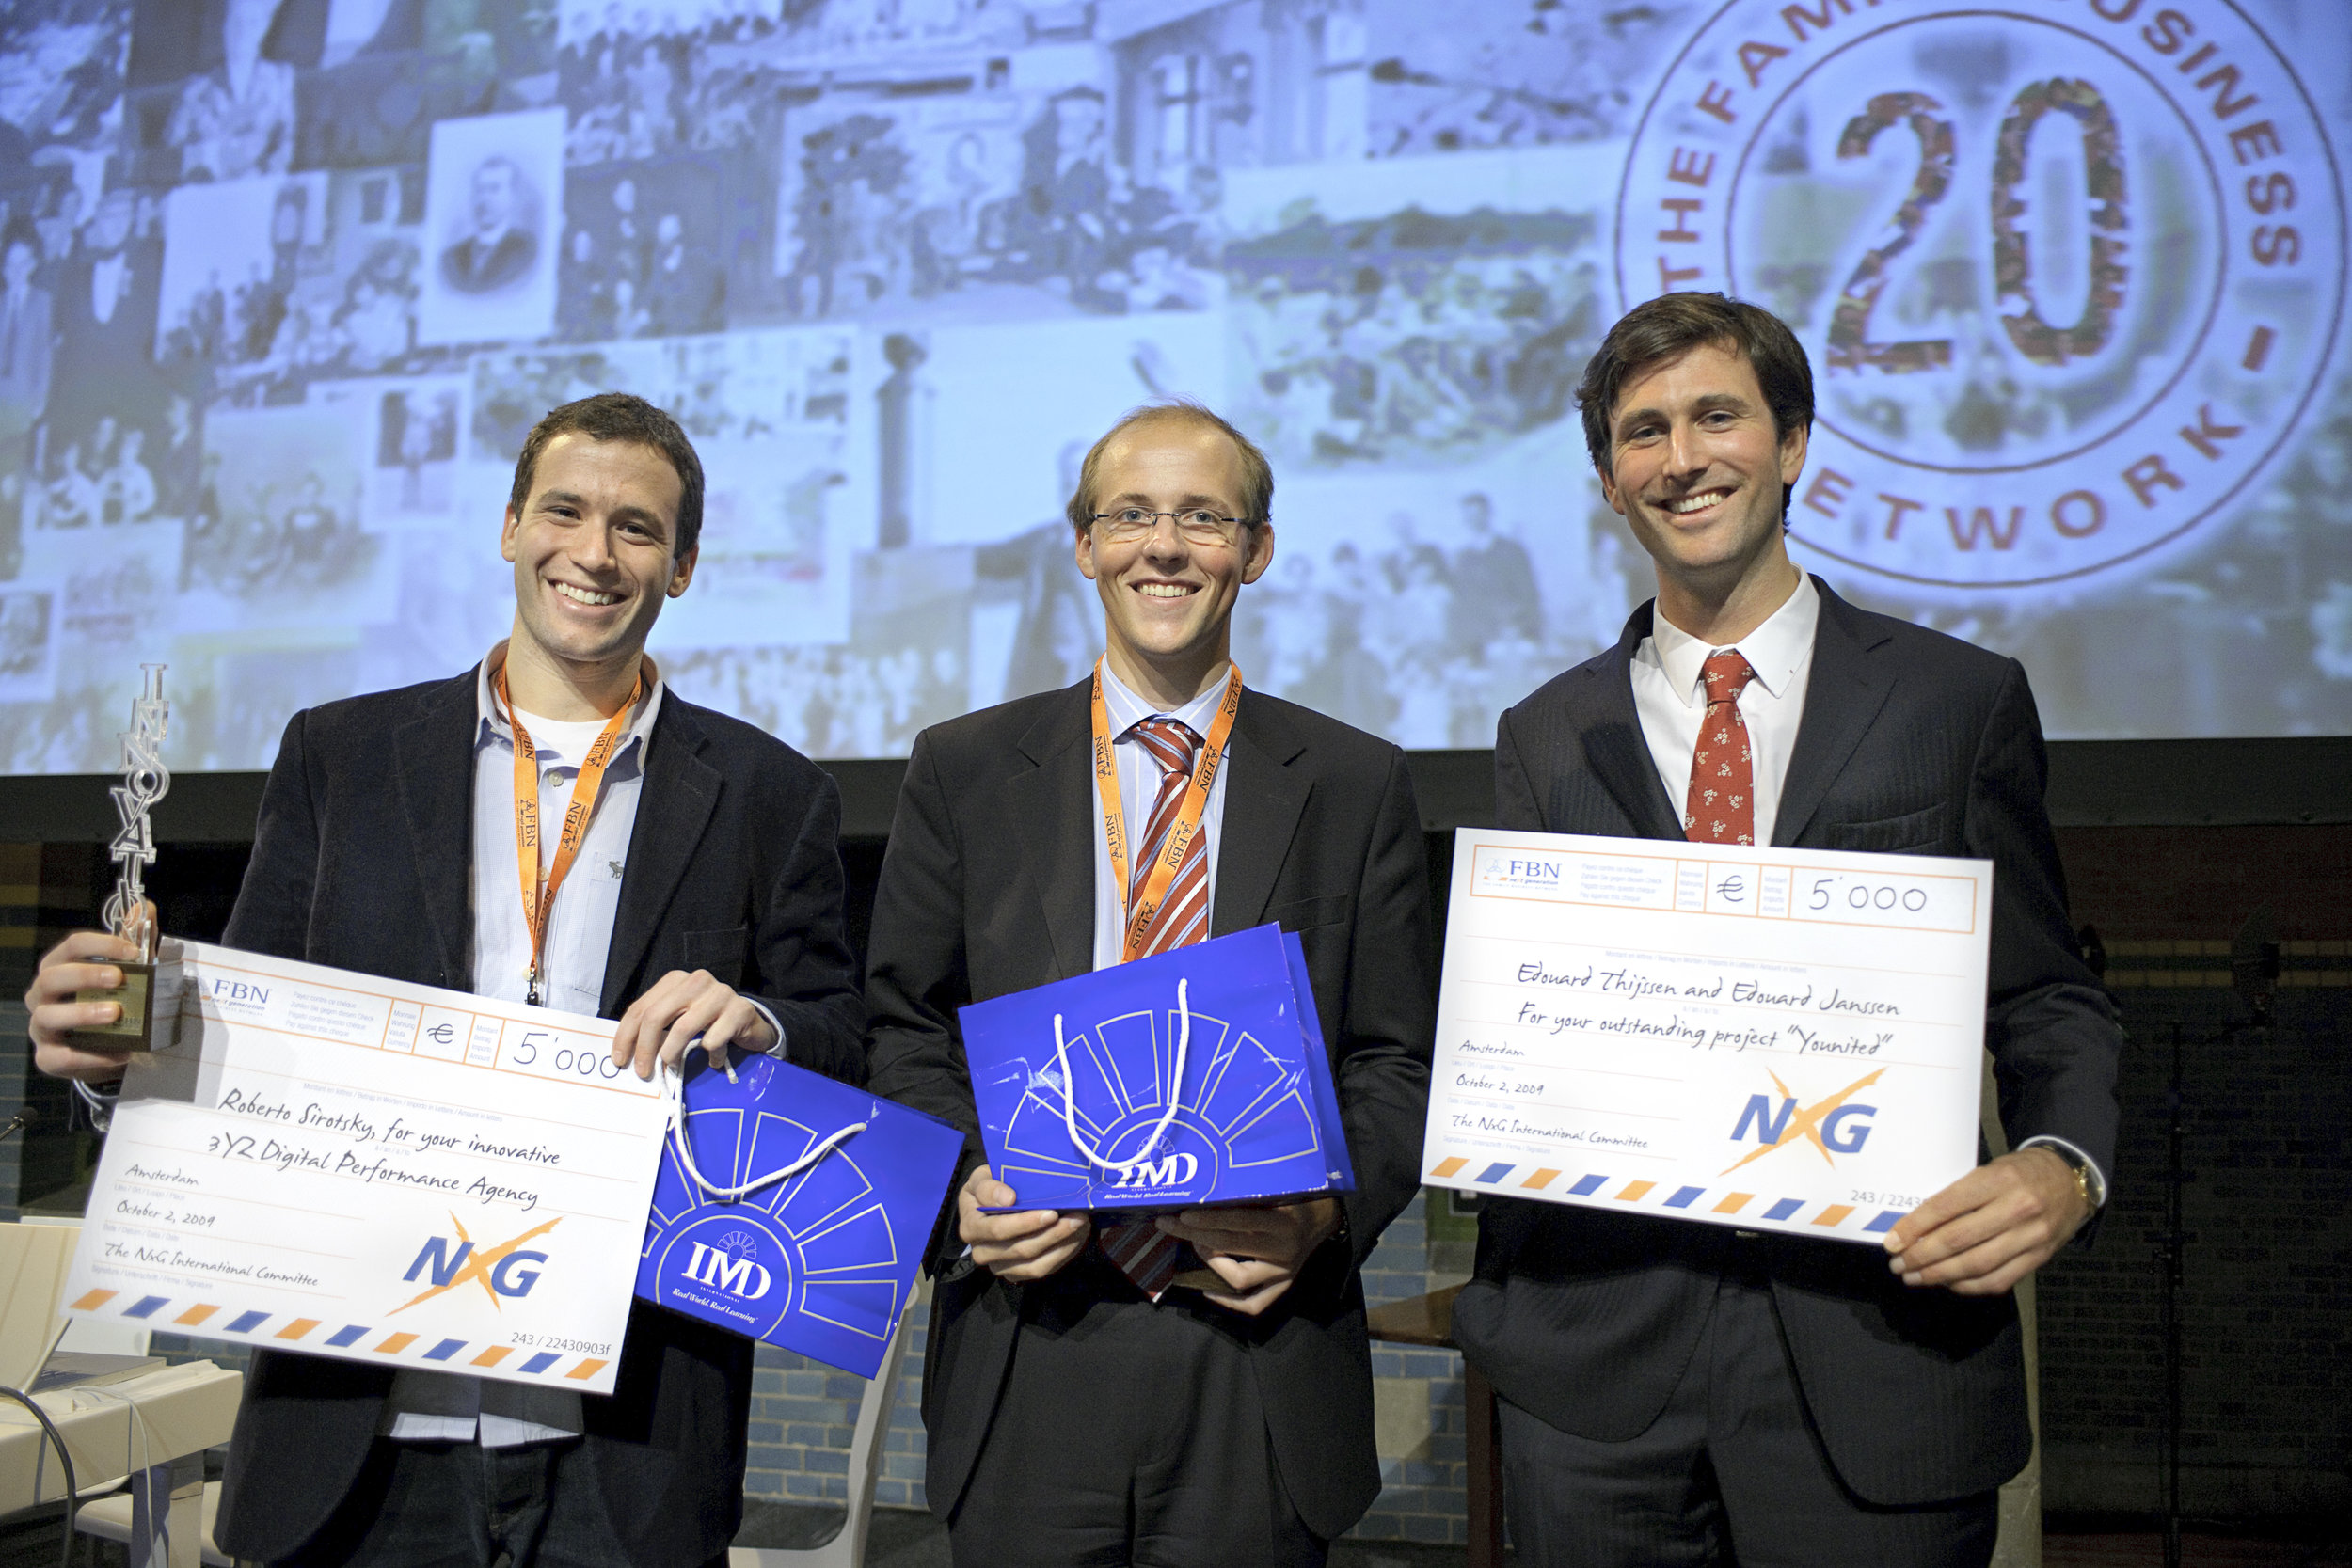 FBN 20th International Summit in Amsterdam, Netherlands